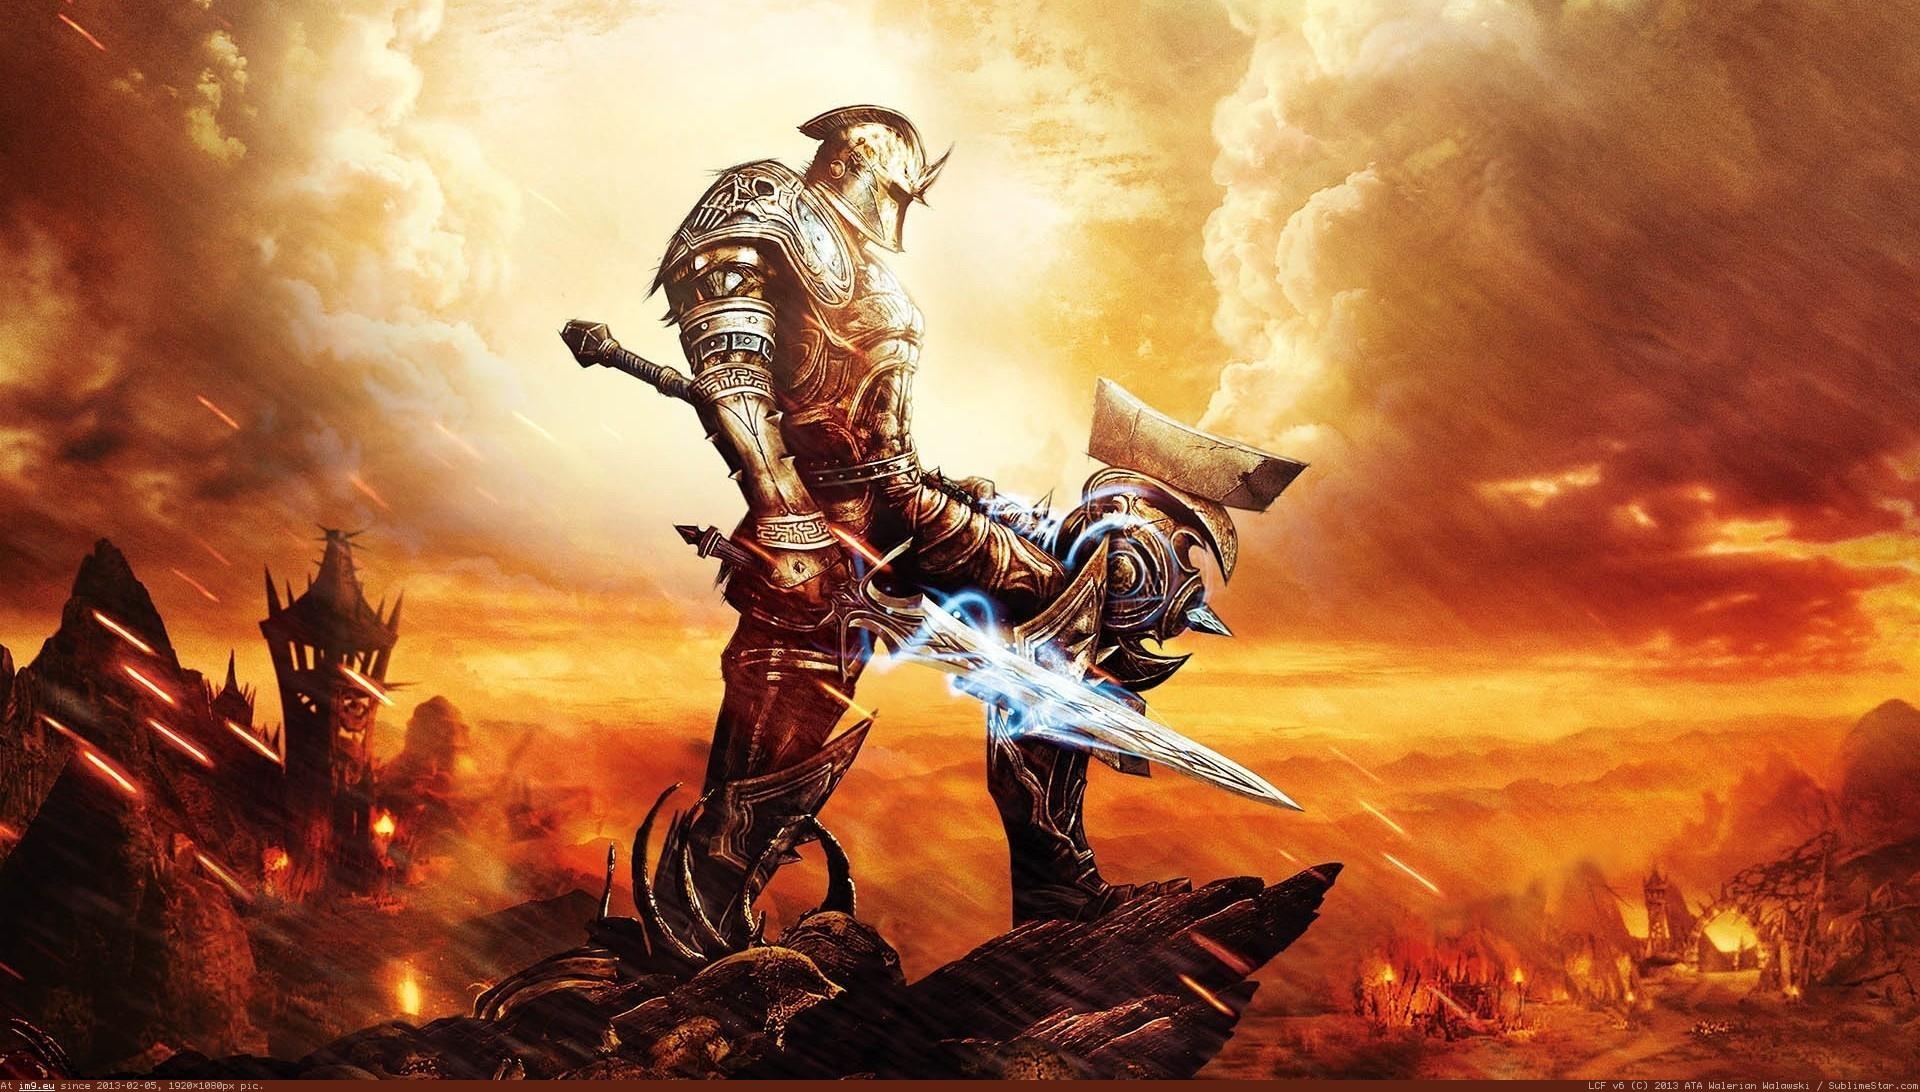 Asuras Wrath fantasy warrior d wallpaper Asura's Wrath Wallpapers Wallpapers )